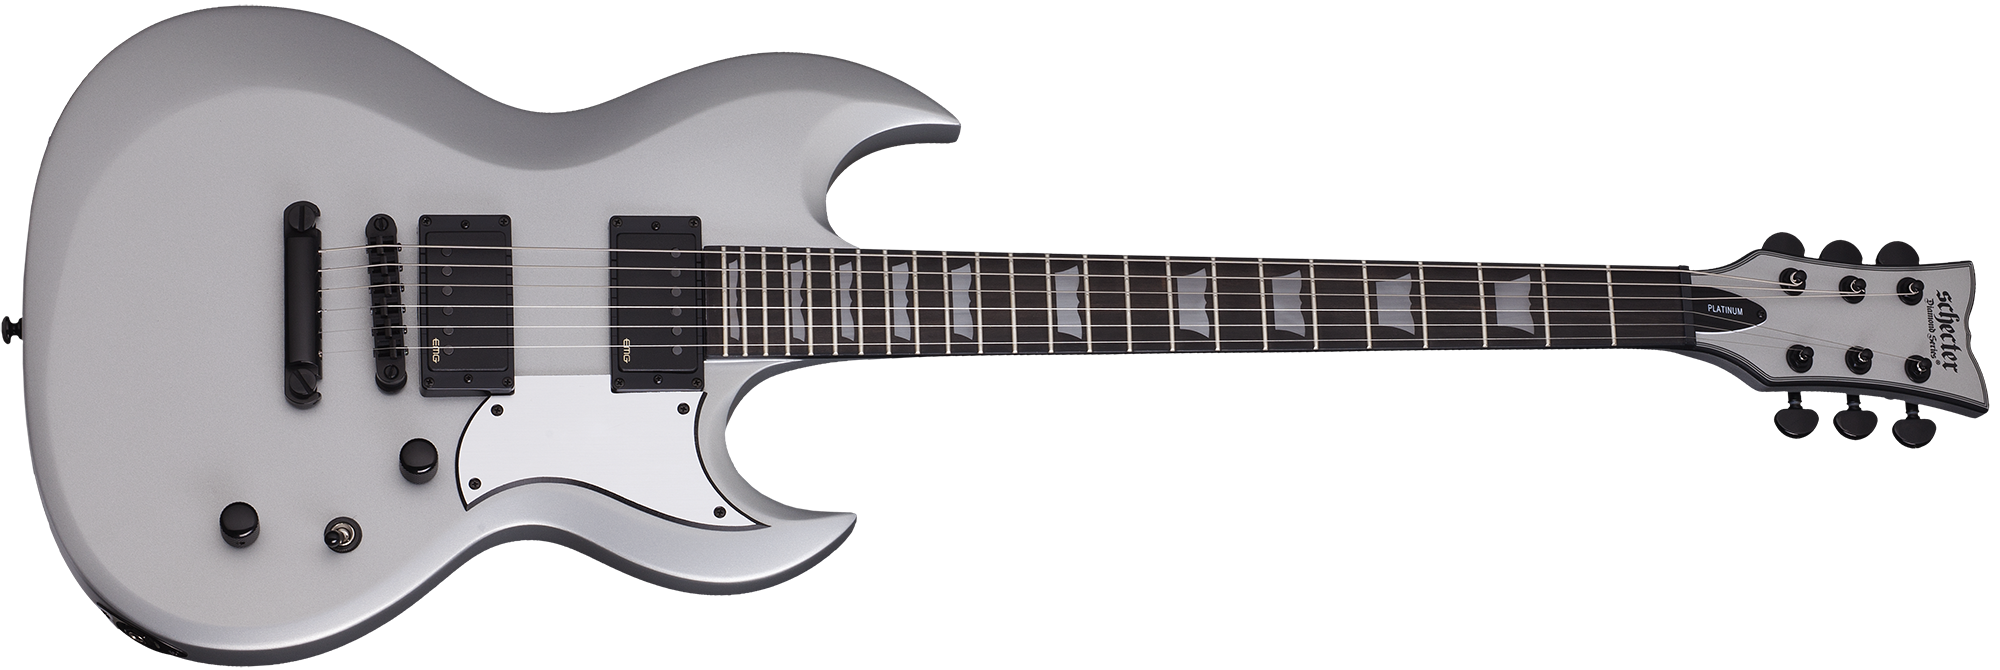 S-II Platinum Satin Silver (SSV) SKU #817